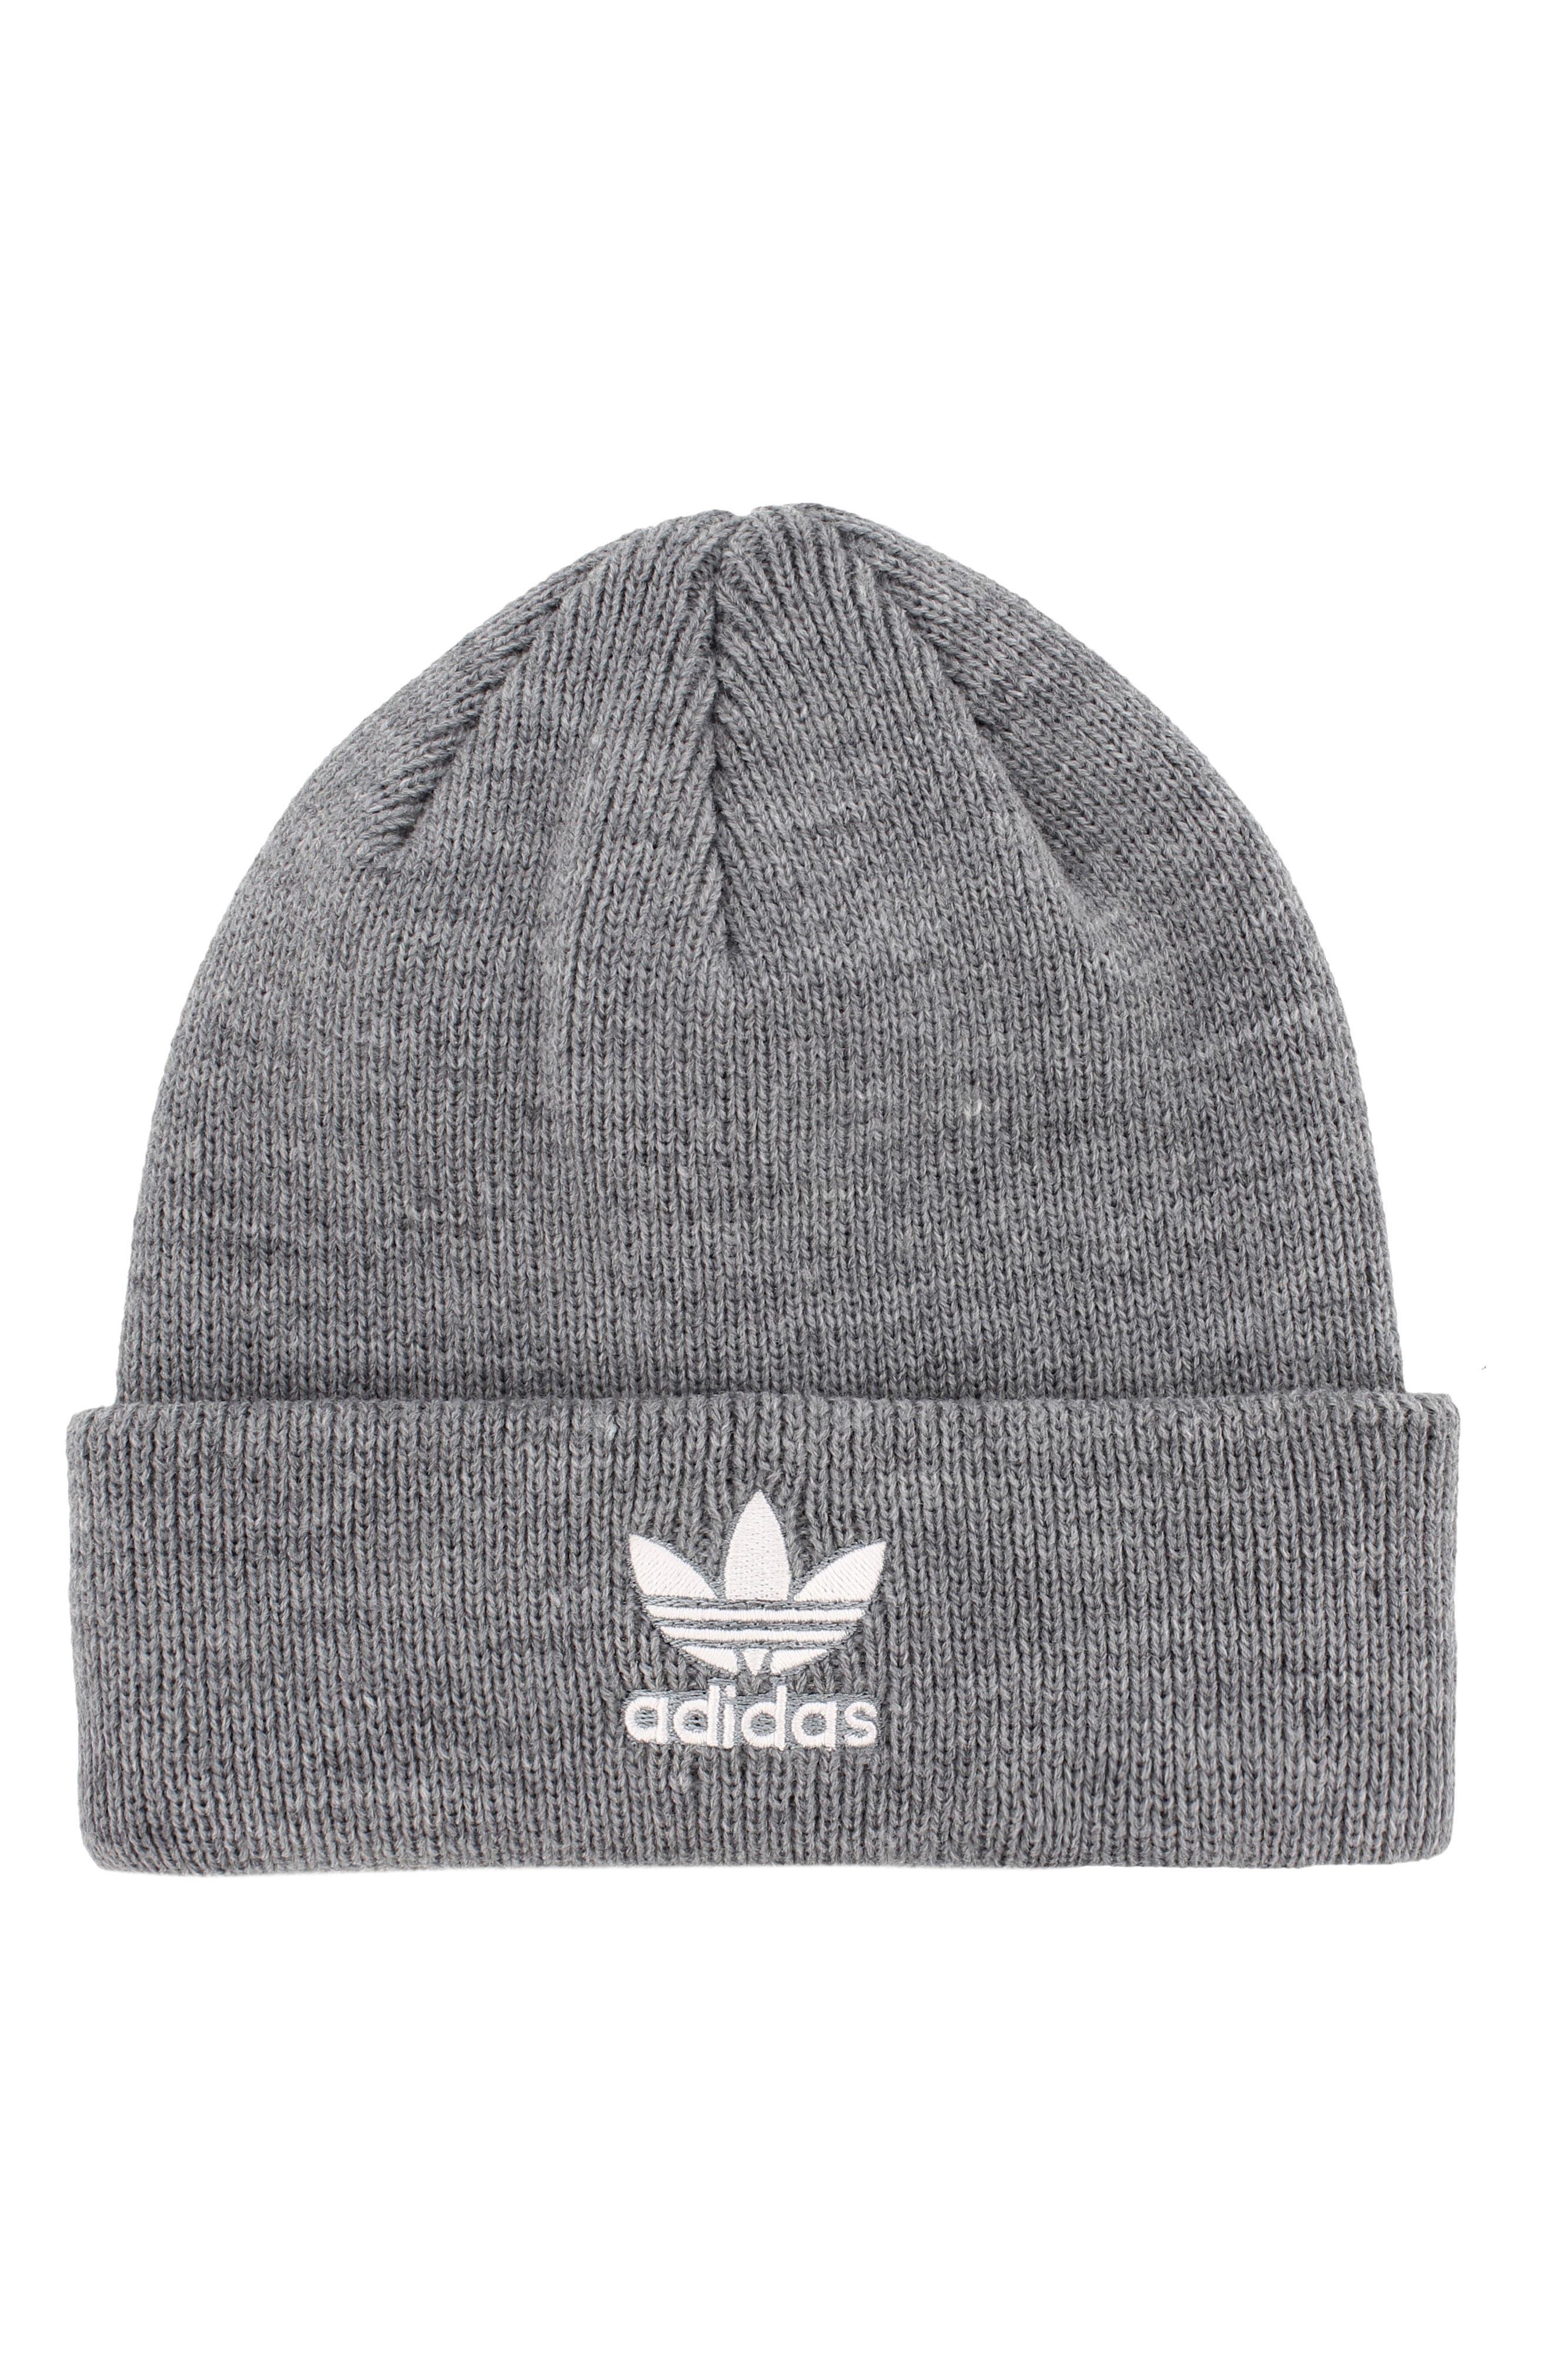 Adidas Trefoil Beanie - Grey